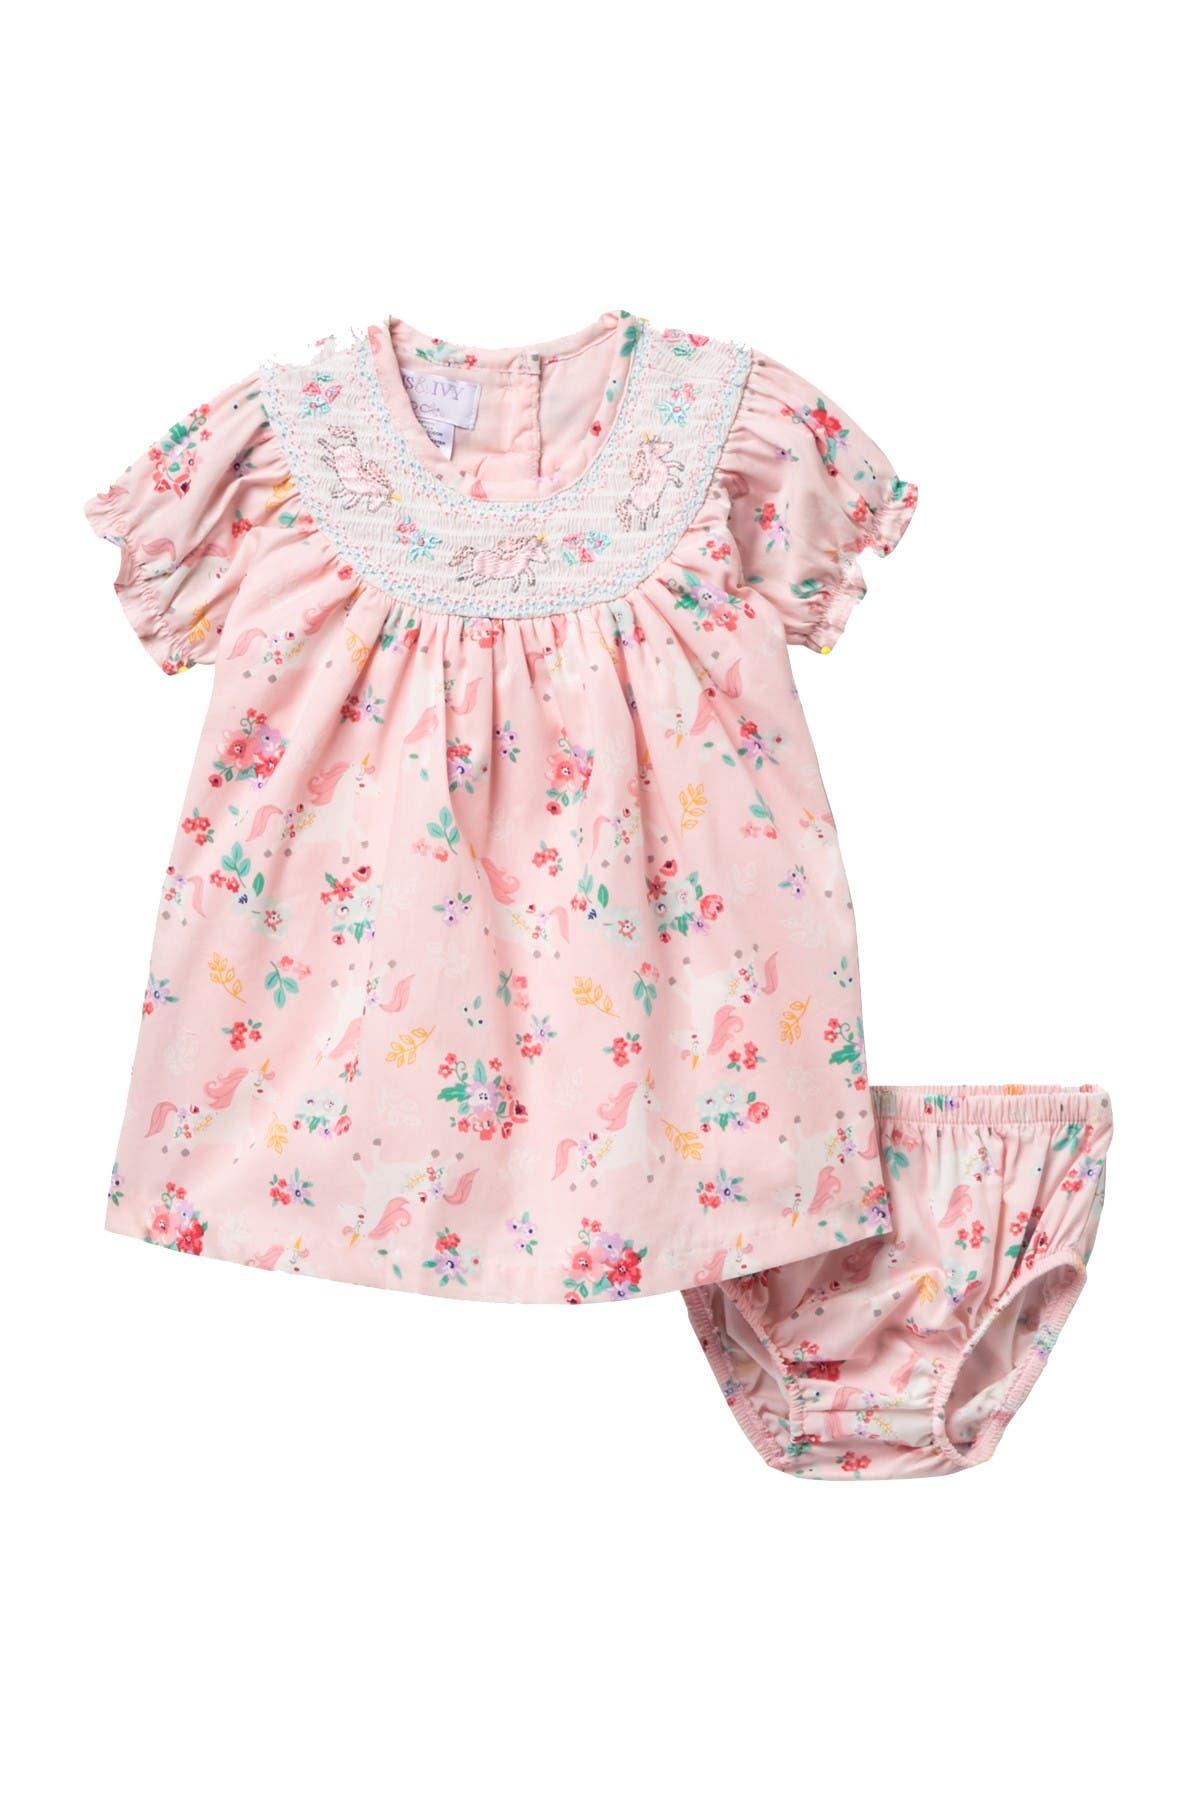 Image of Iris & Ivy Raglan Sleeve Unicorn Print Dress & Bloomers Set